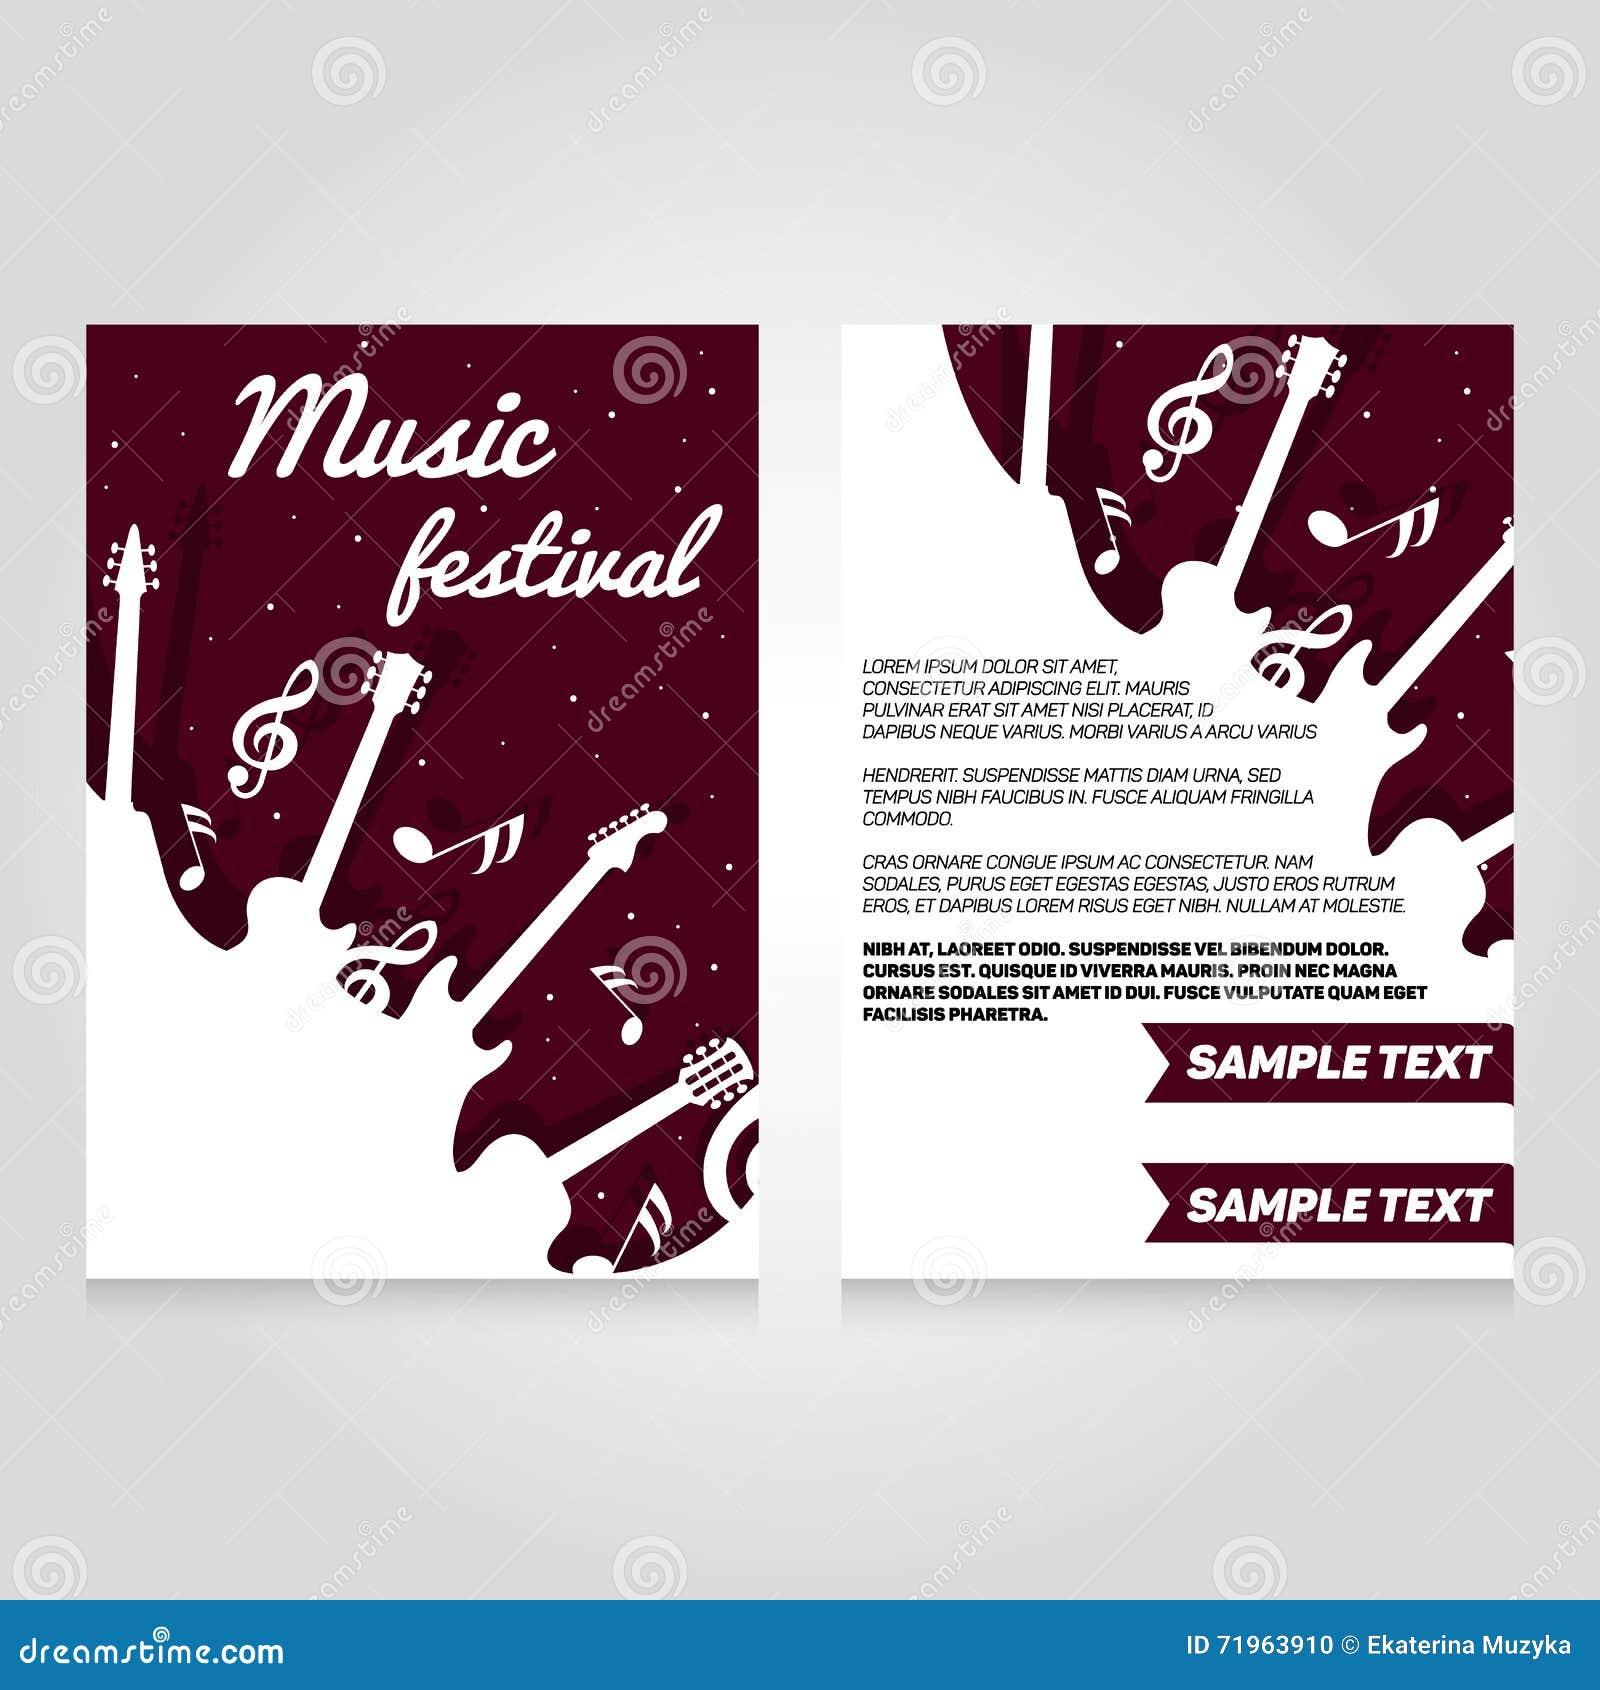 music brochure templates - music festival brochure flier design template stock